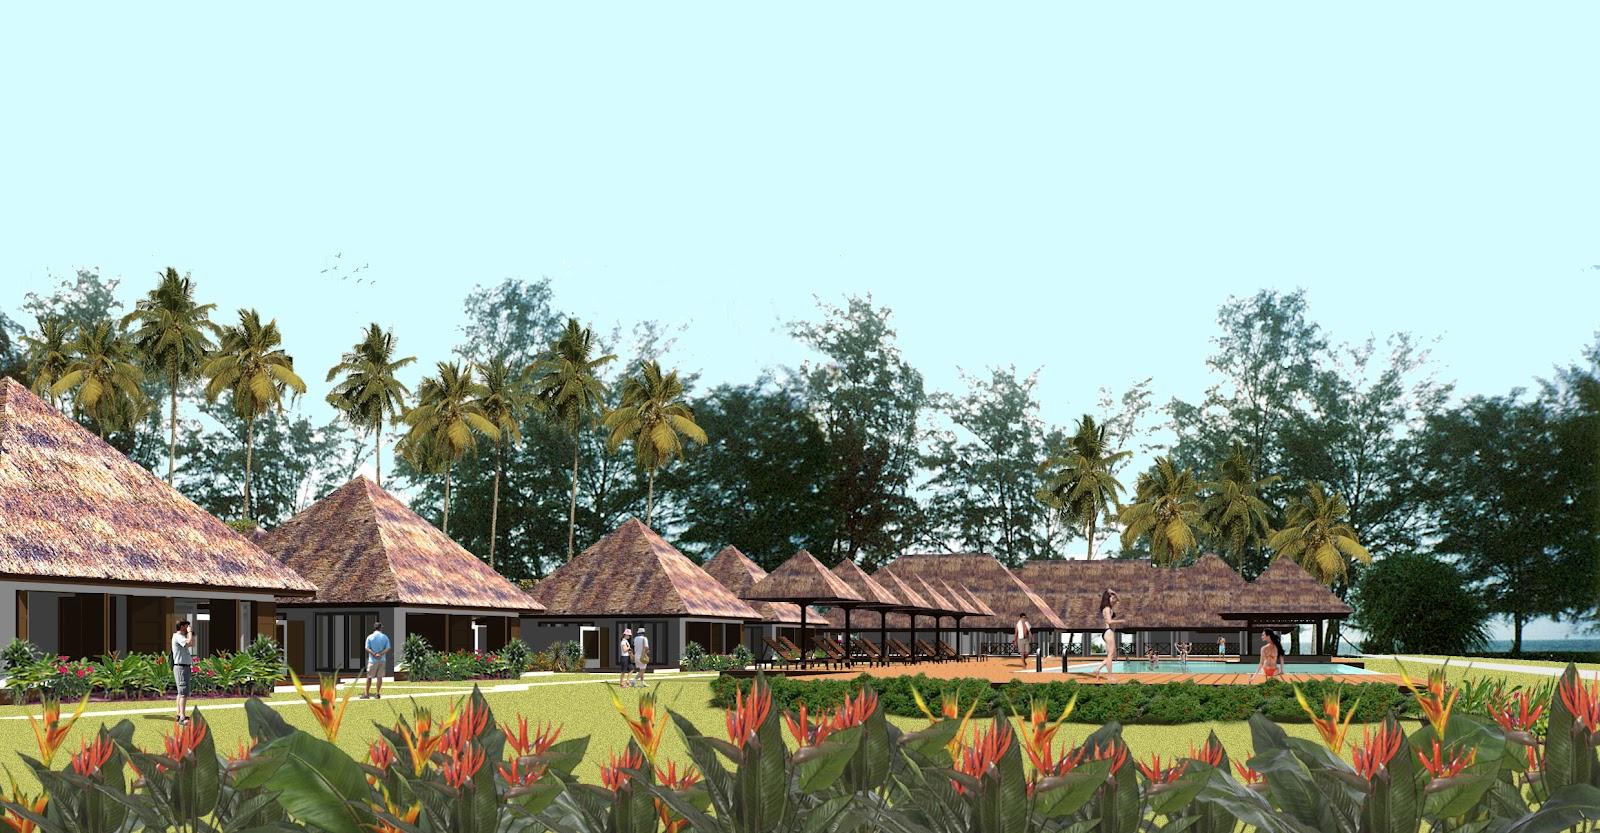 lanjut ecovillages malaysia lanjut beach ecovillage. Black Bedroom Furniture Sets. Home Design Ideas